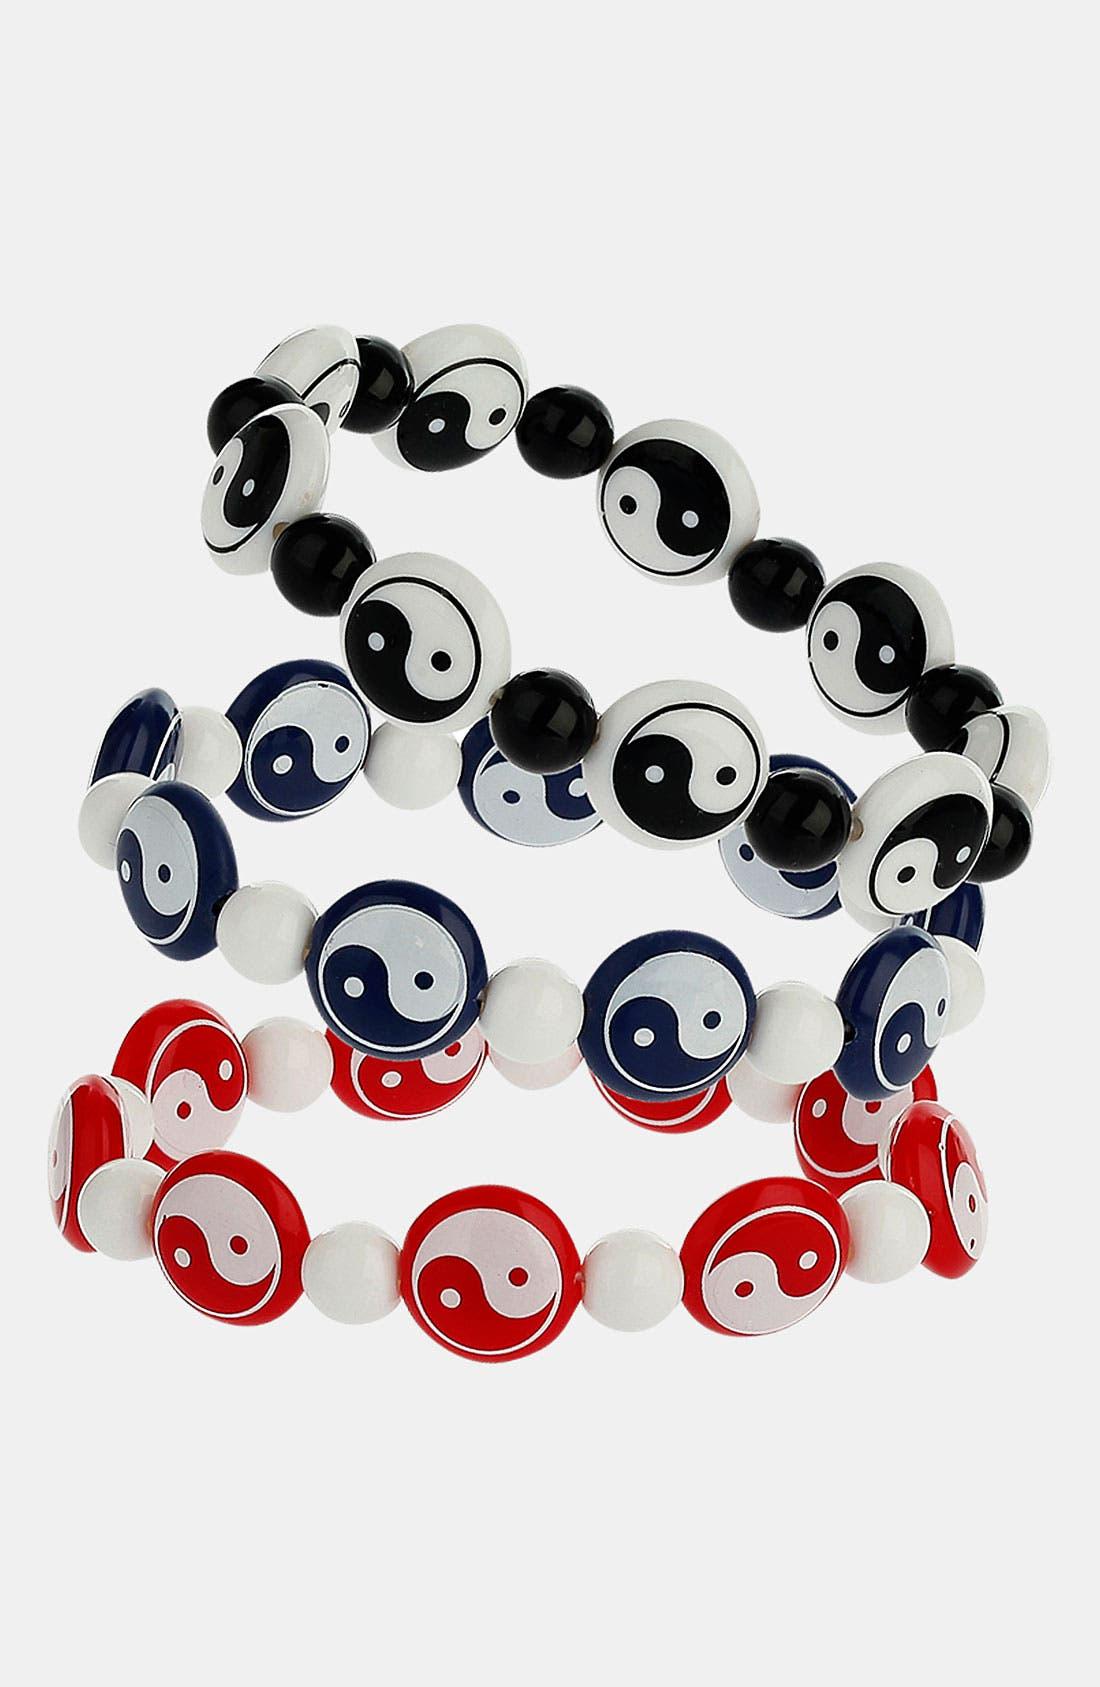 Alternate Image 1 Selected - Topman 'Yin & Yang' Beaded Stretch Bracelets (Set of 3)